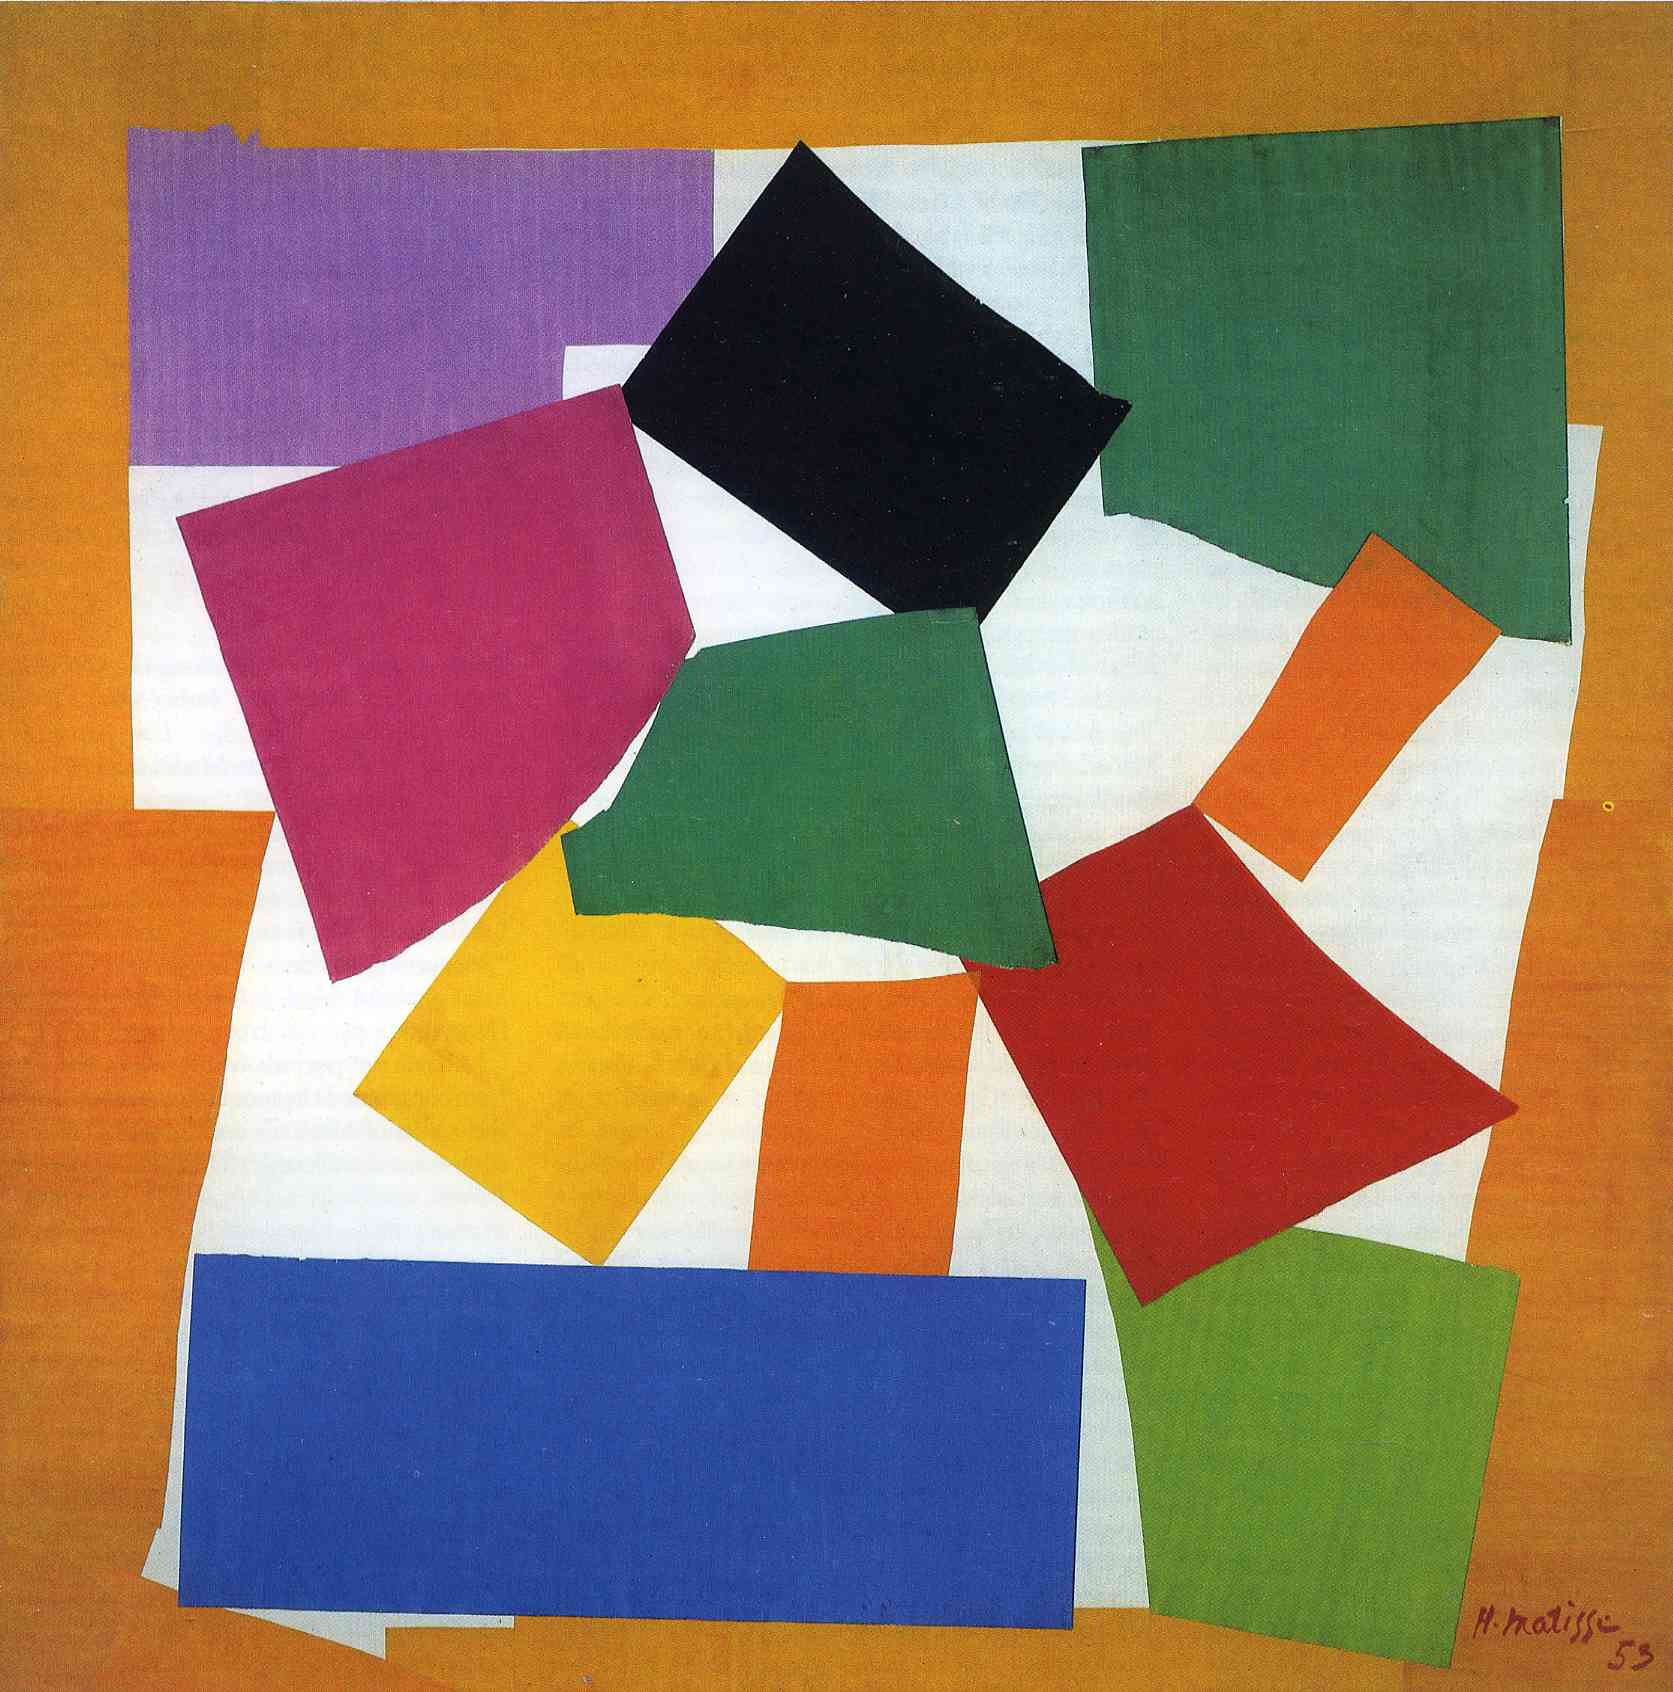 henri-matisse-the-snail-1953